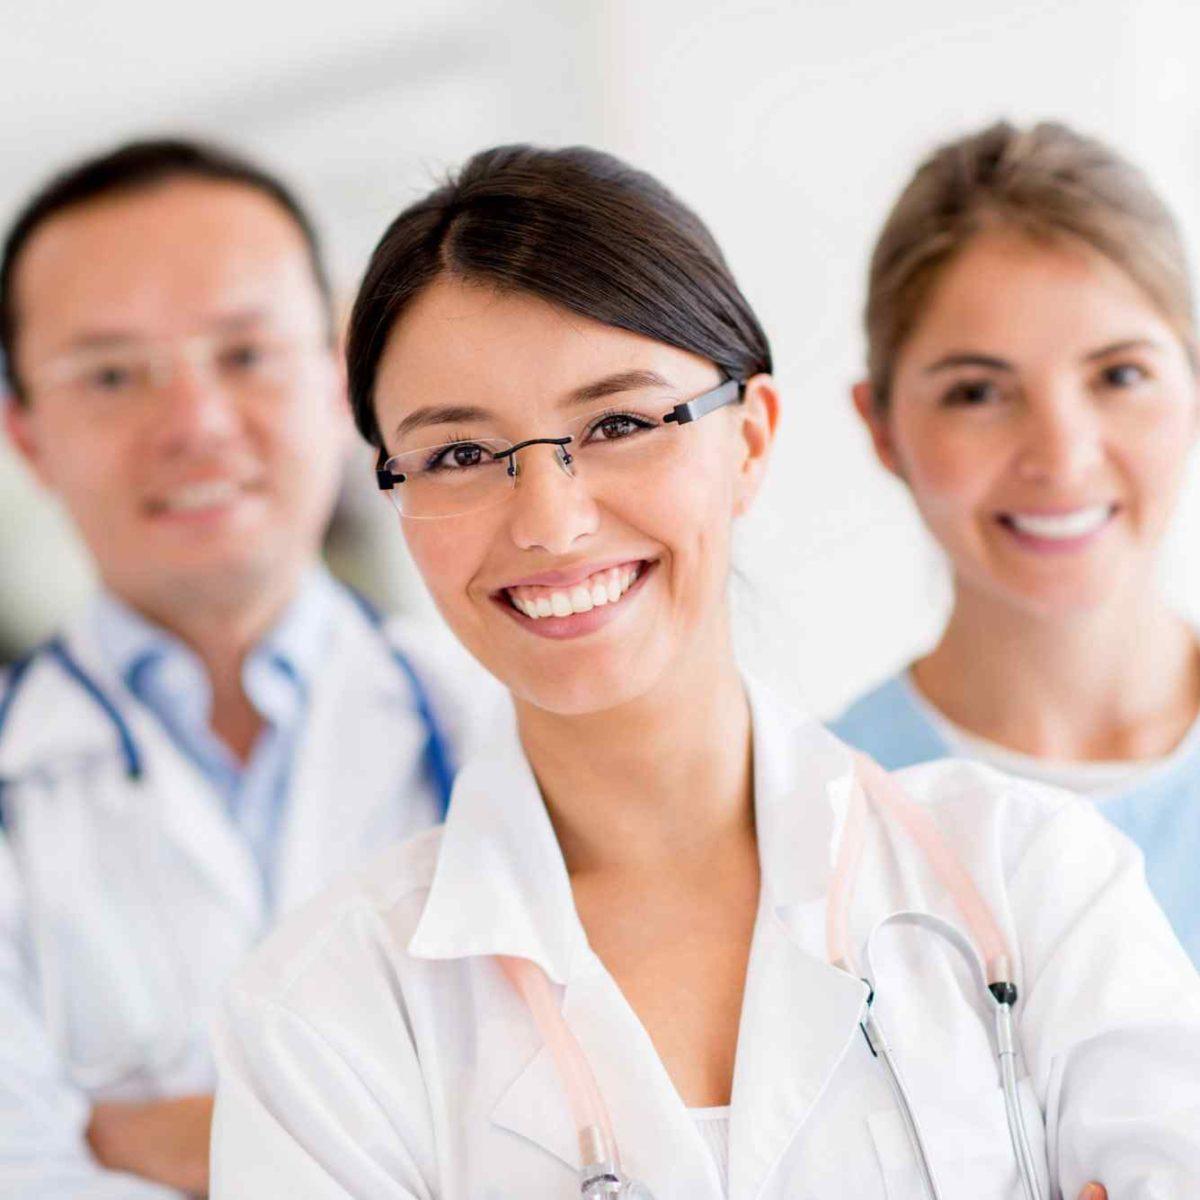 doctors_square-1200x1200.jpg